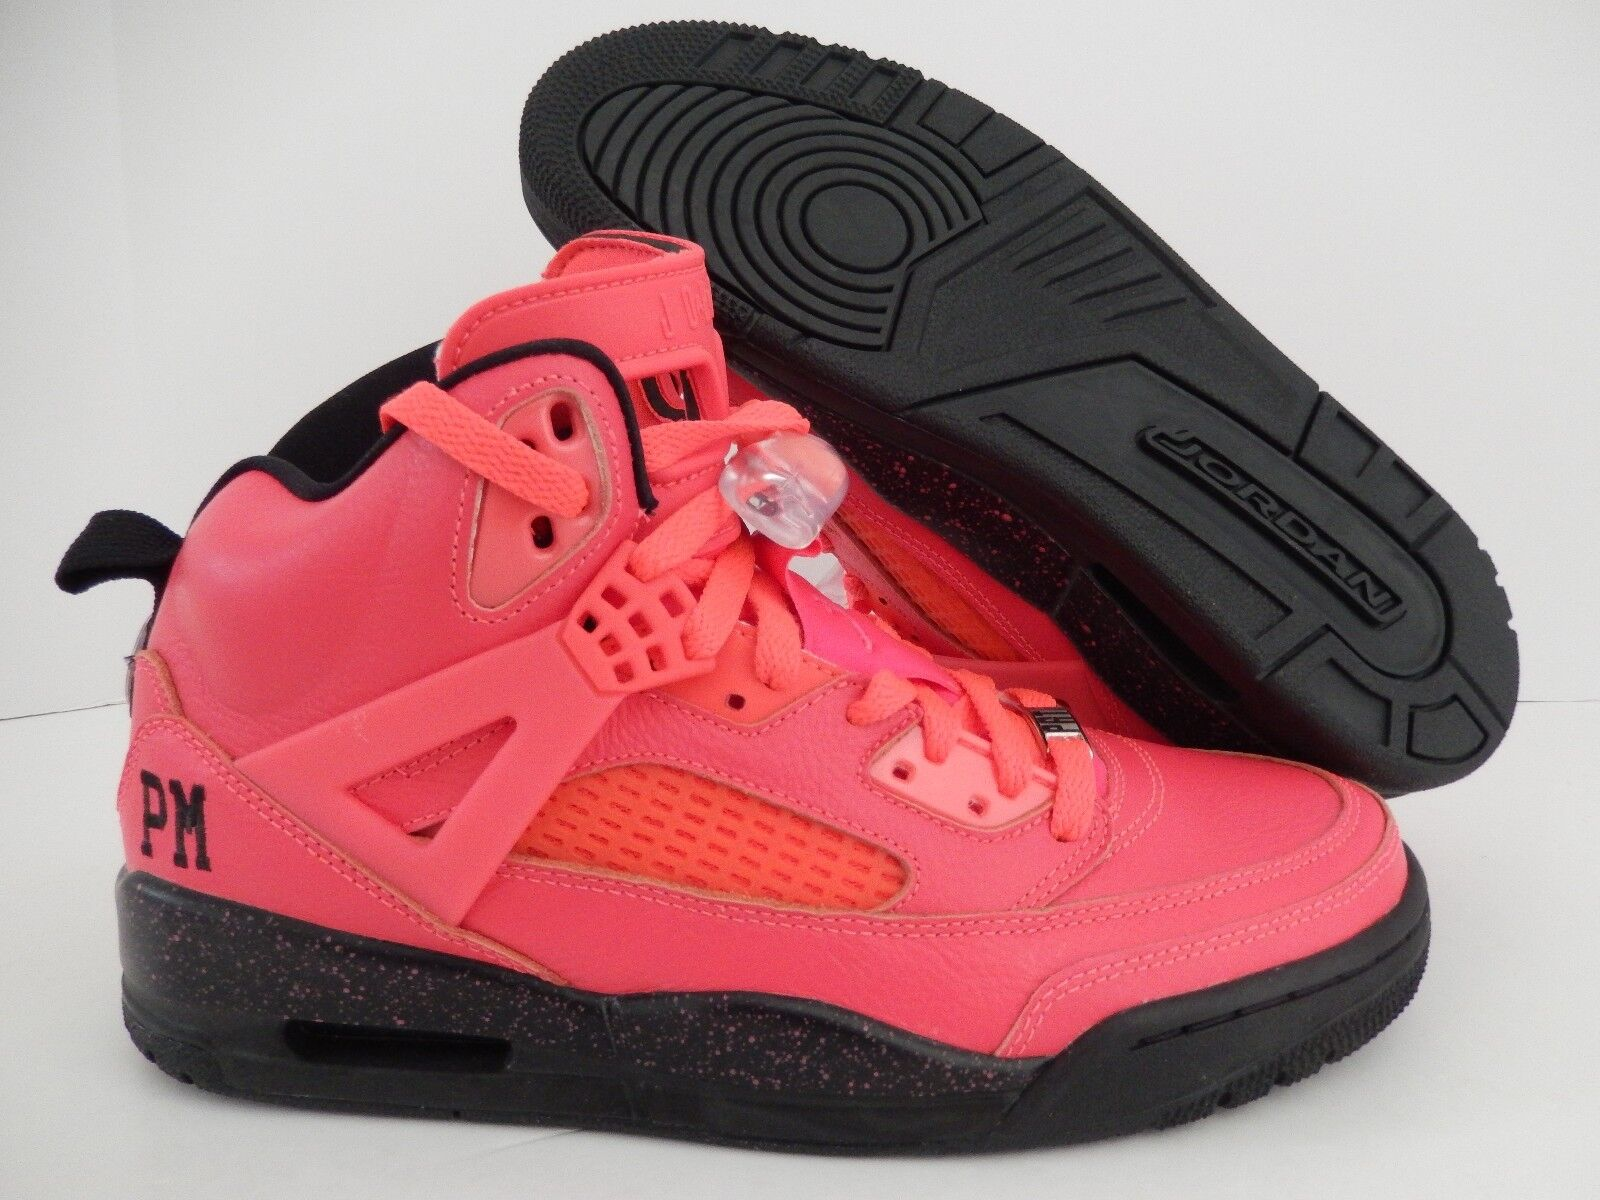 Nike Air Jordan Spizike Id Sz Infrared Pink 9 605236 999 Sepatu Casual Sb Stefan Janoski Light Retro Original 333824 405